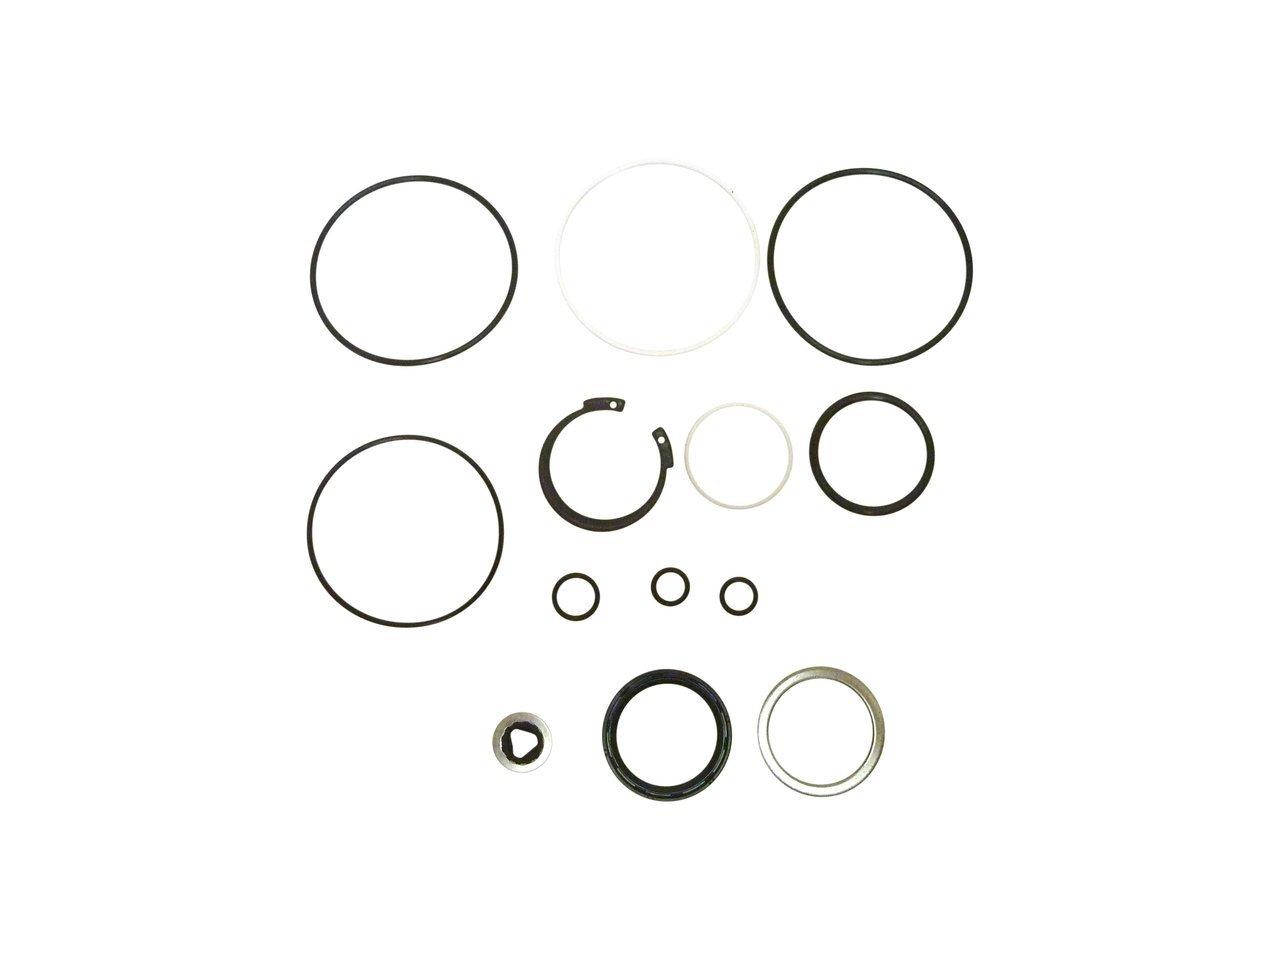 Power Steering Box Gasket Seal Kit suitable for